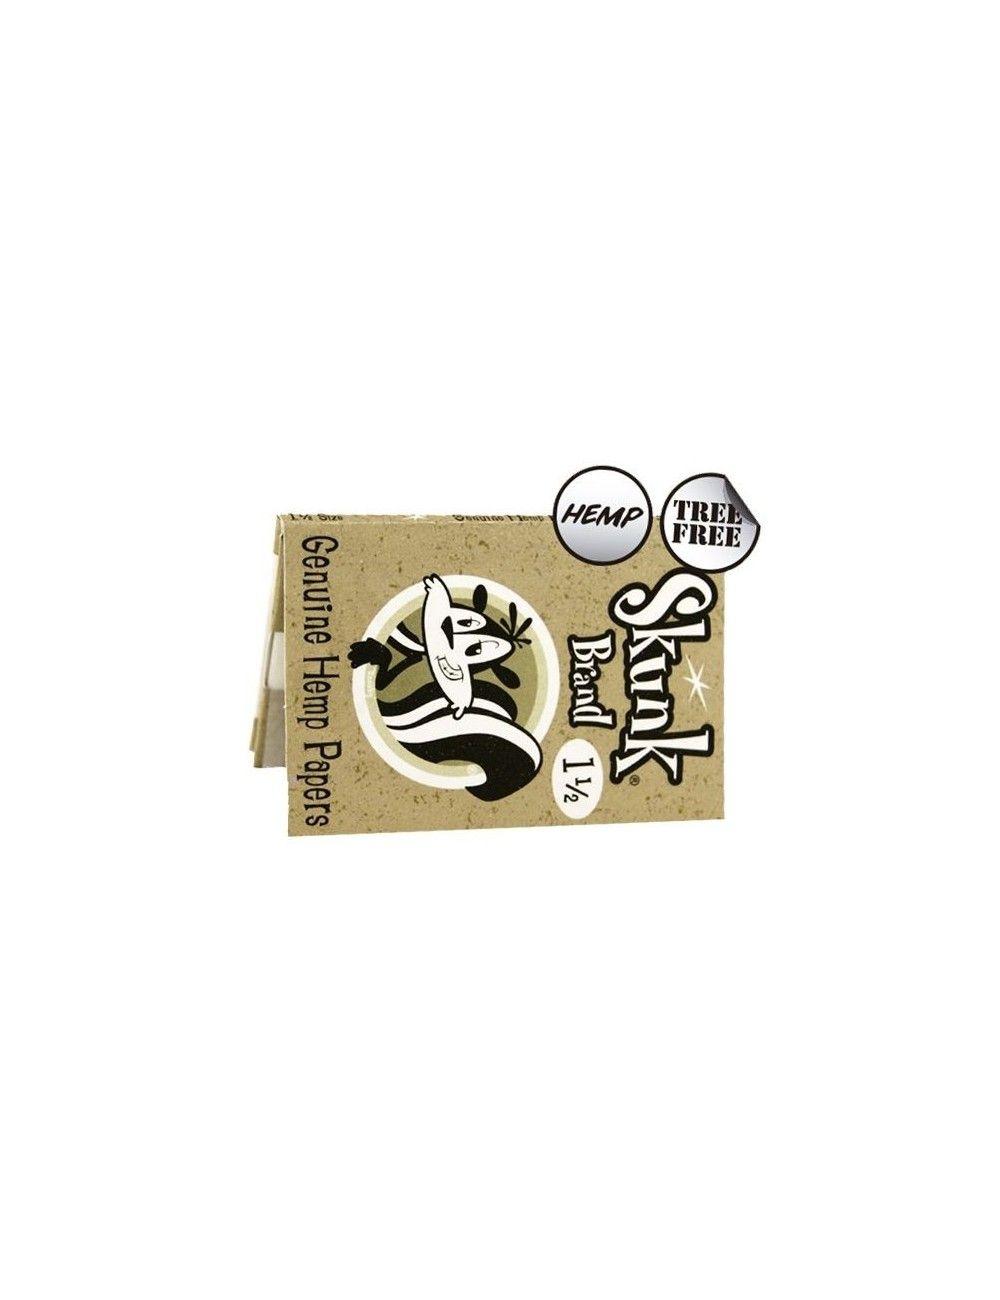 Skunk Brand 1 1/2